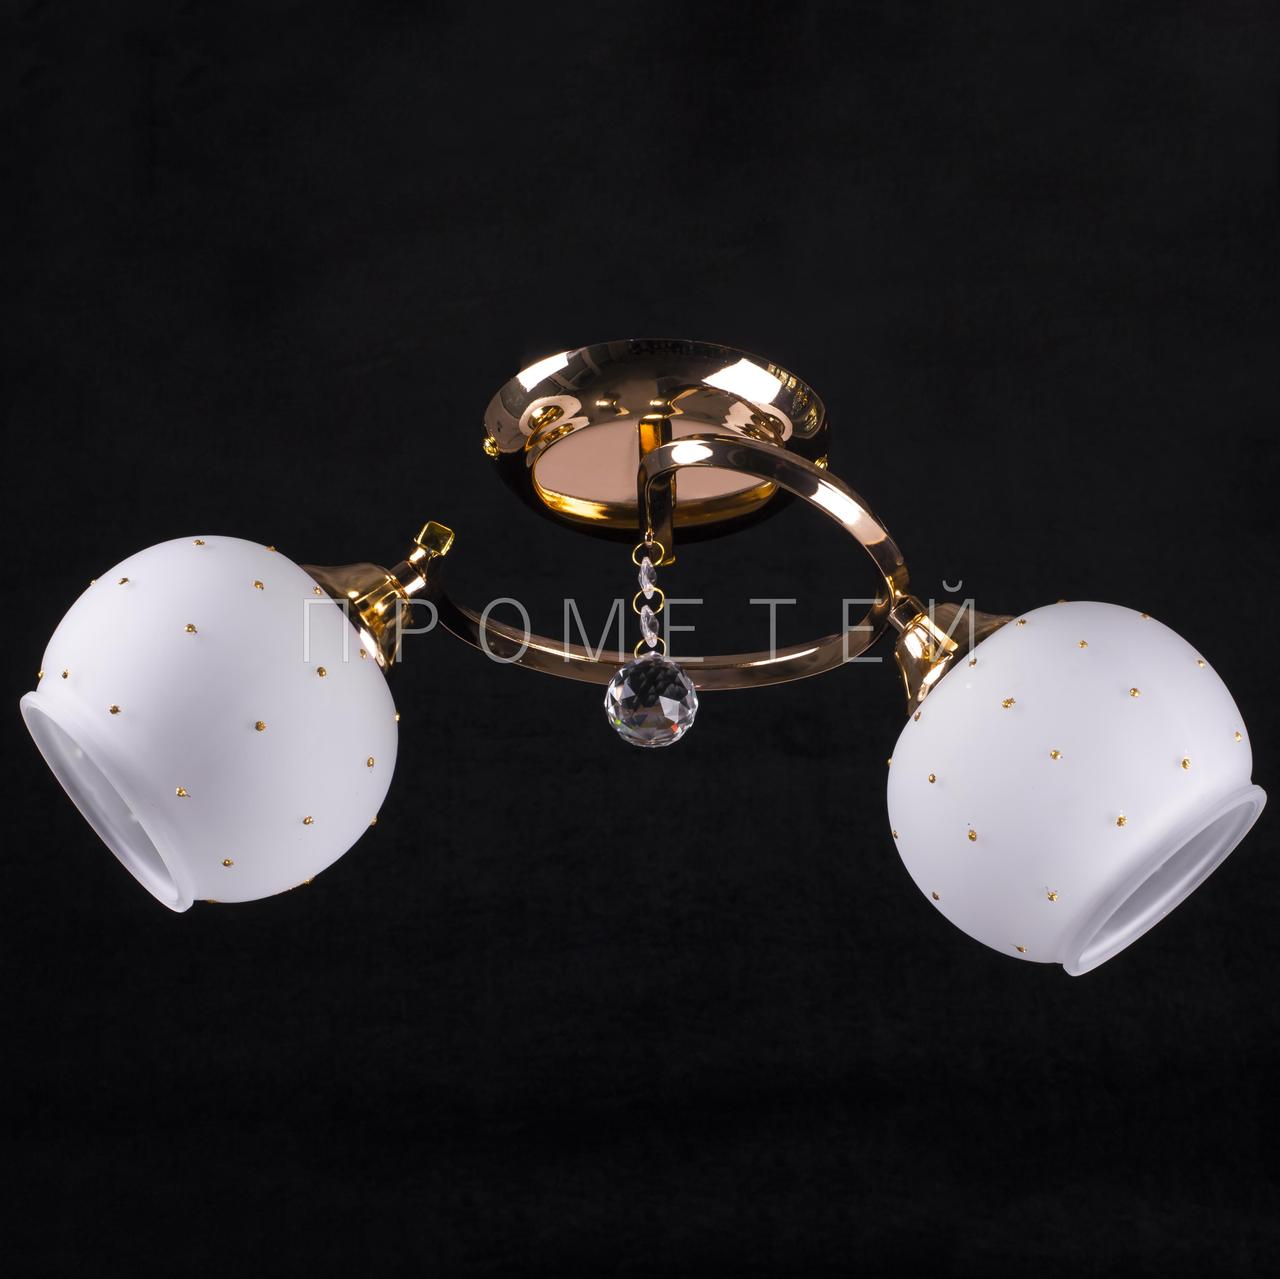 Припотолочная люстра на две лампочки (золото) P3-719/2C/FG+WT